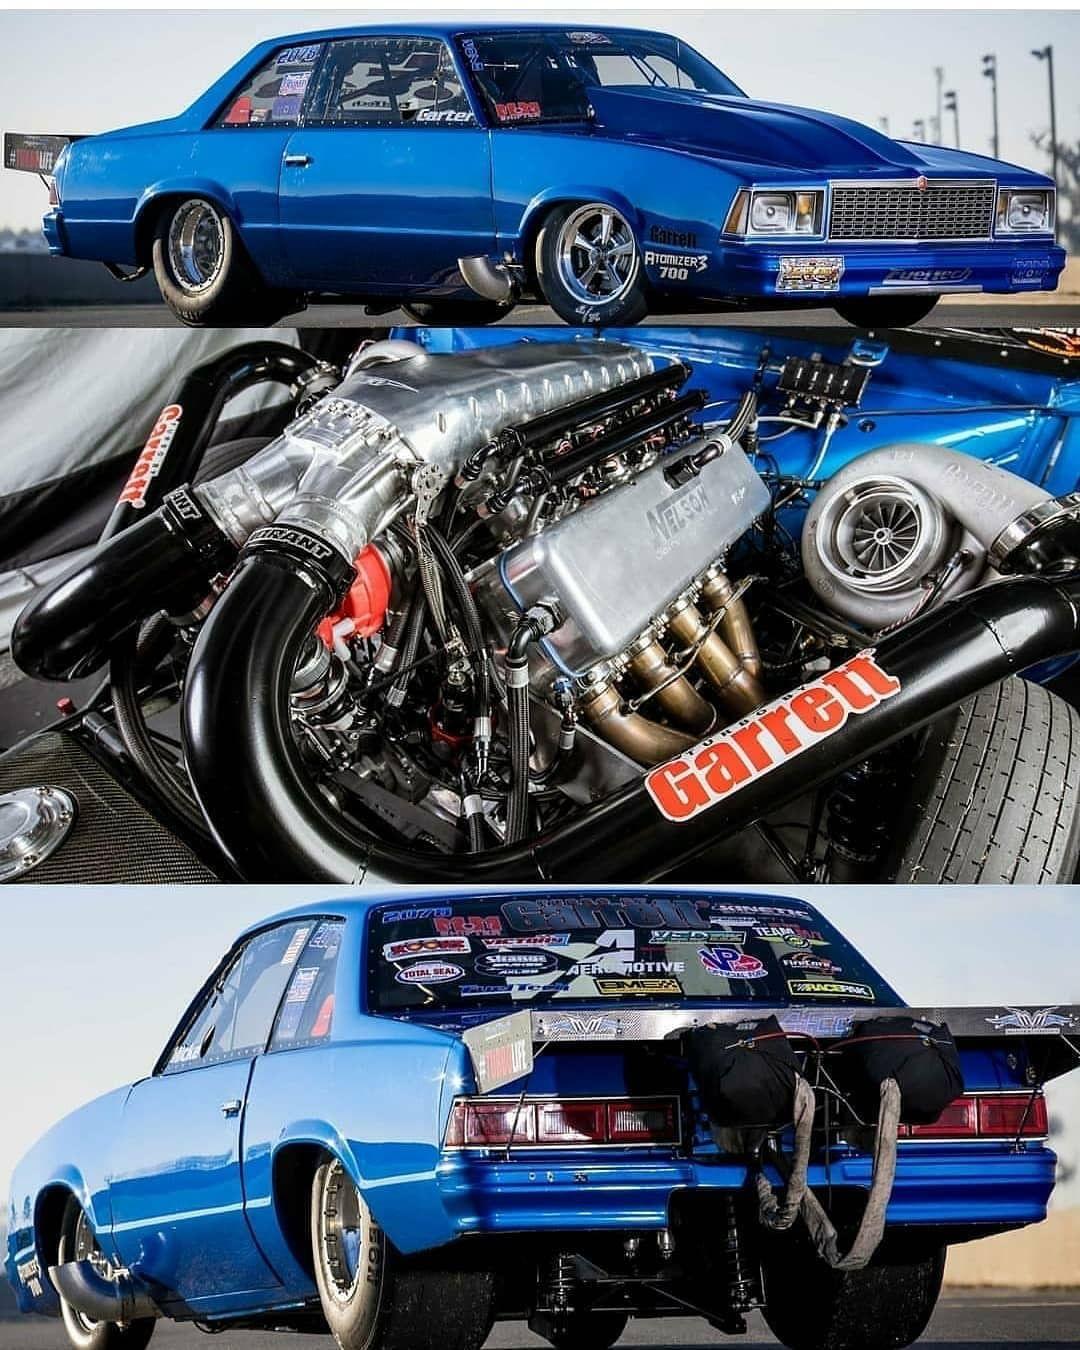 Malibu race car | 78-81 Chevy Malibu | Pinterest | Cars, Power cars ...